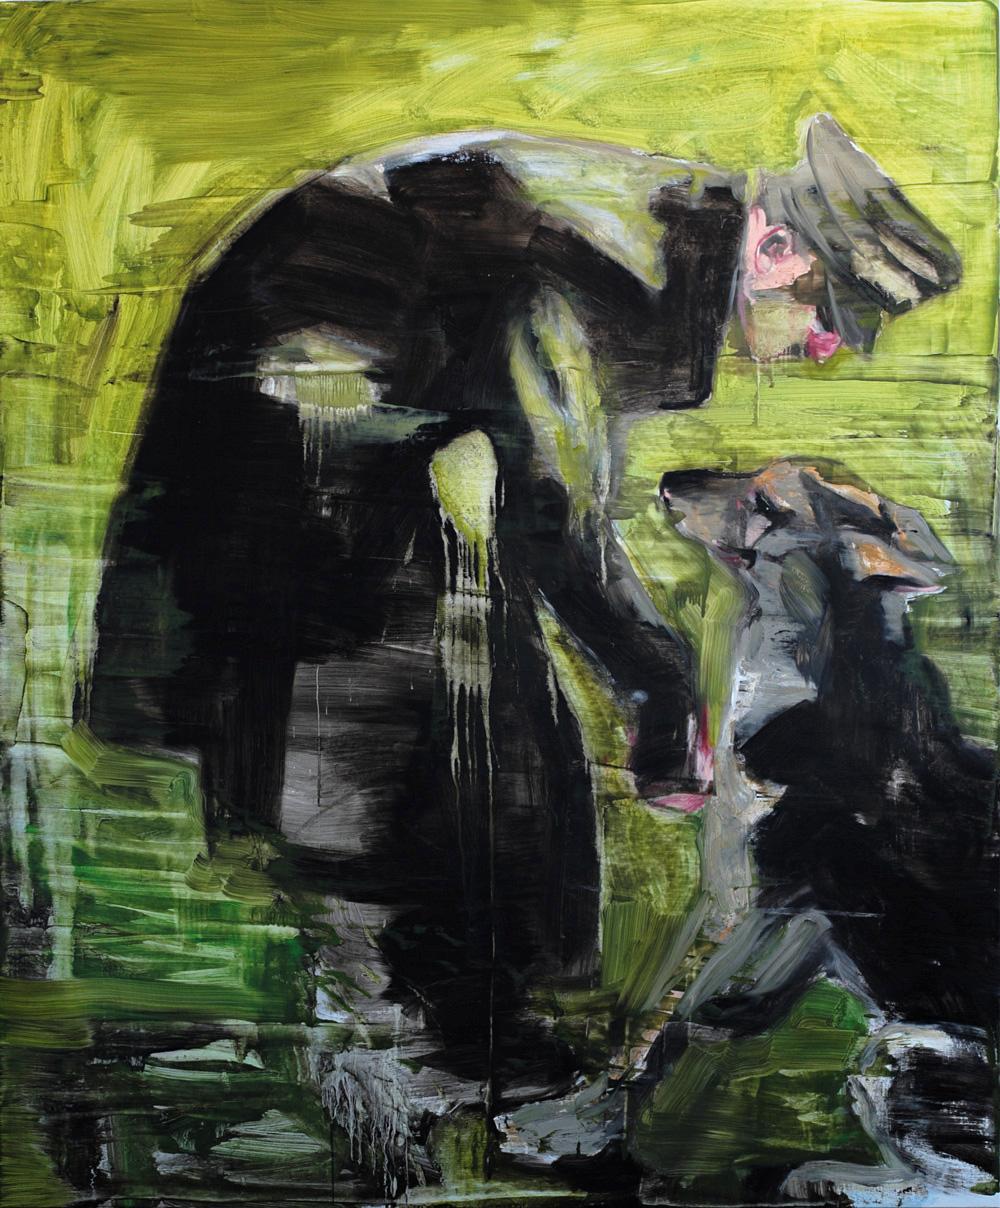 Paolo Maggis 2014 Judas' mistery 195x163cm